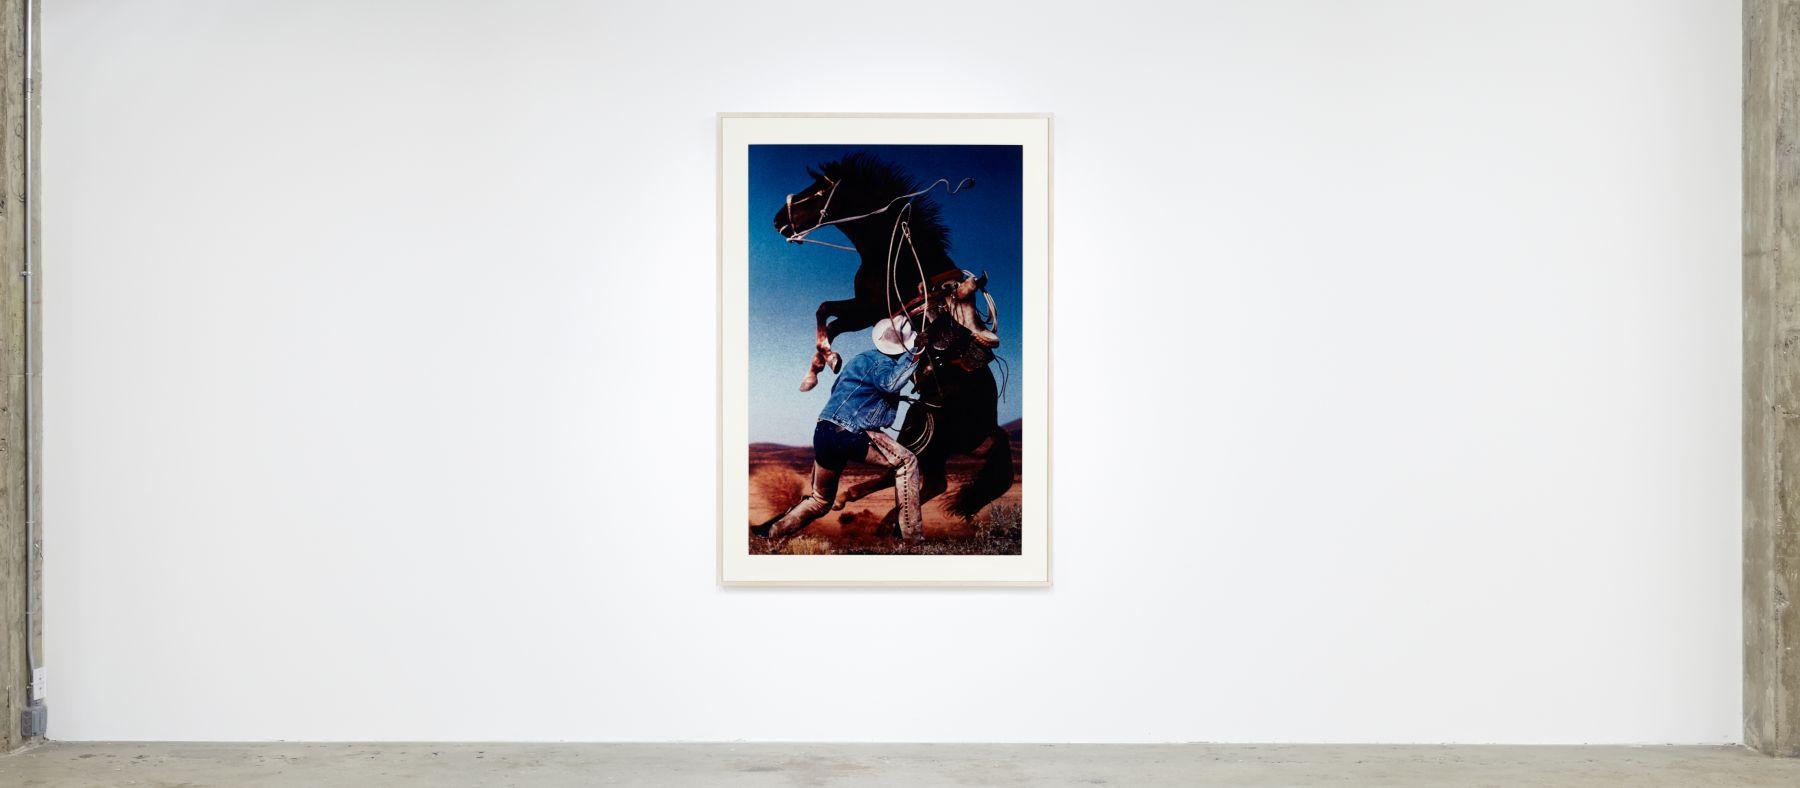 #RAWHIDE Richard Prince Untitled (Cowboy) (Rearing Horse)